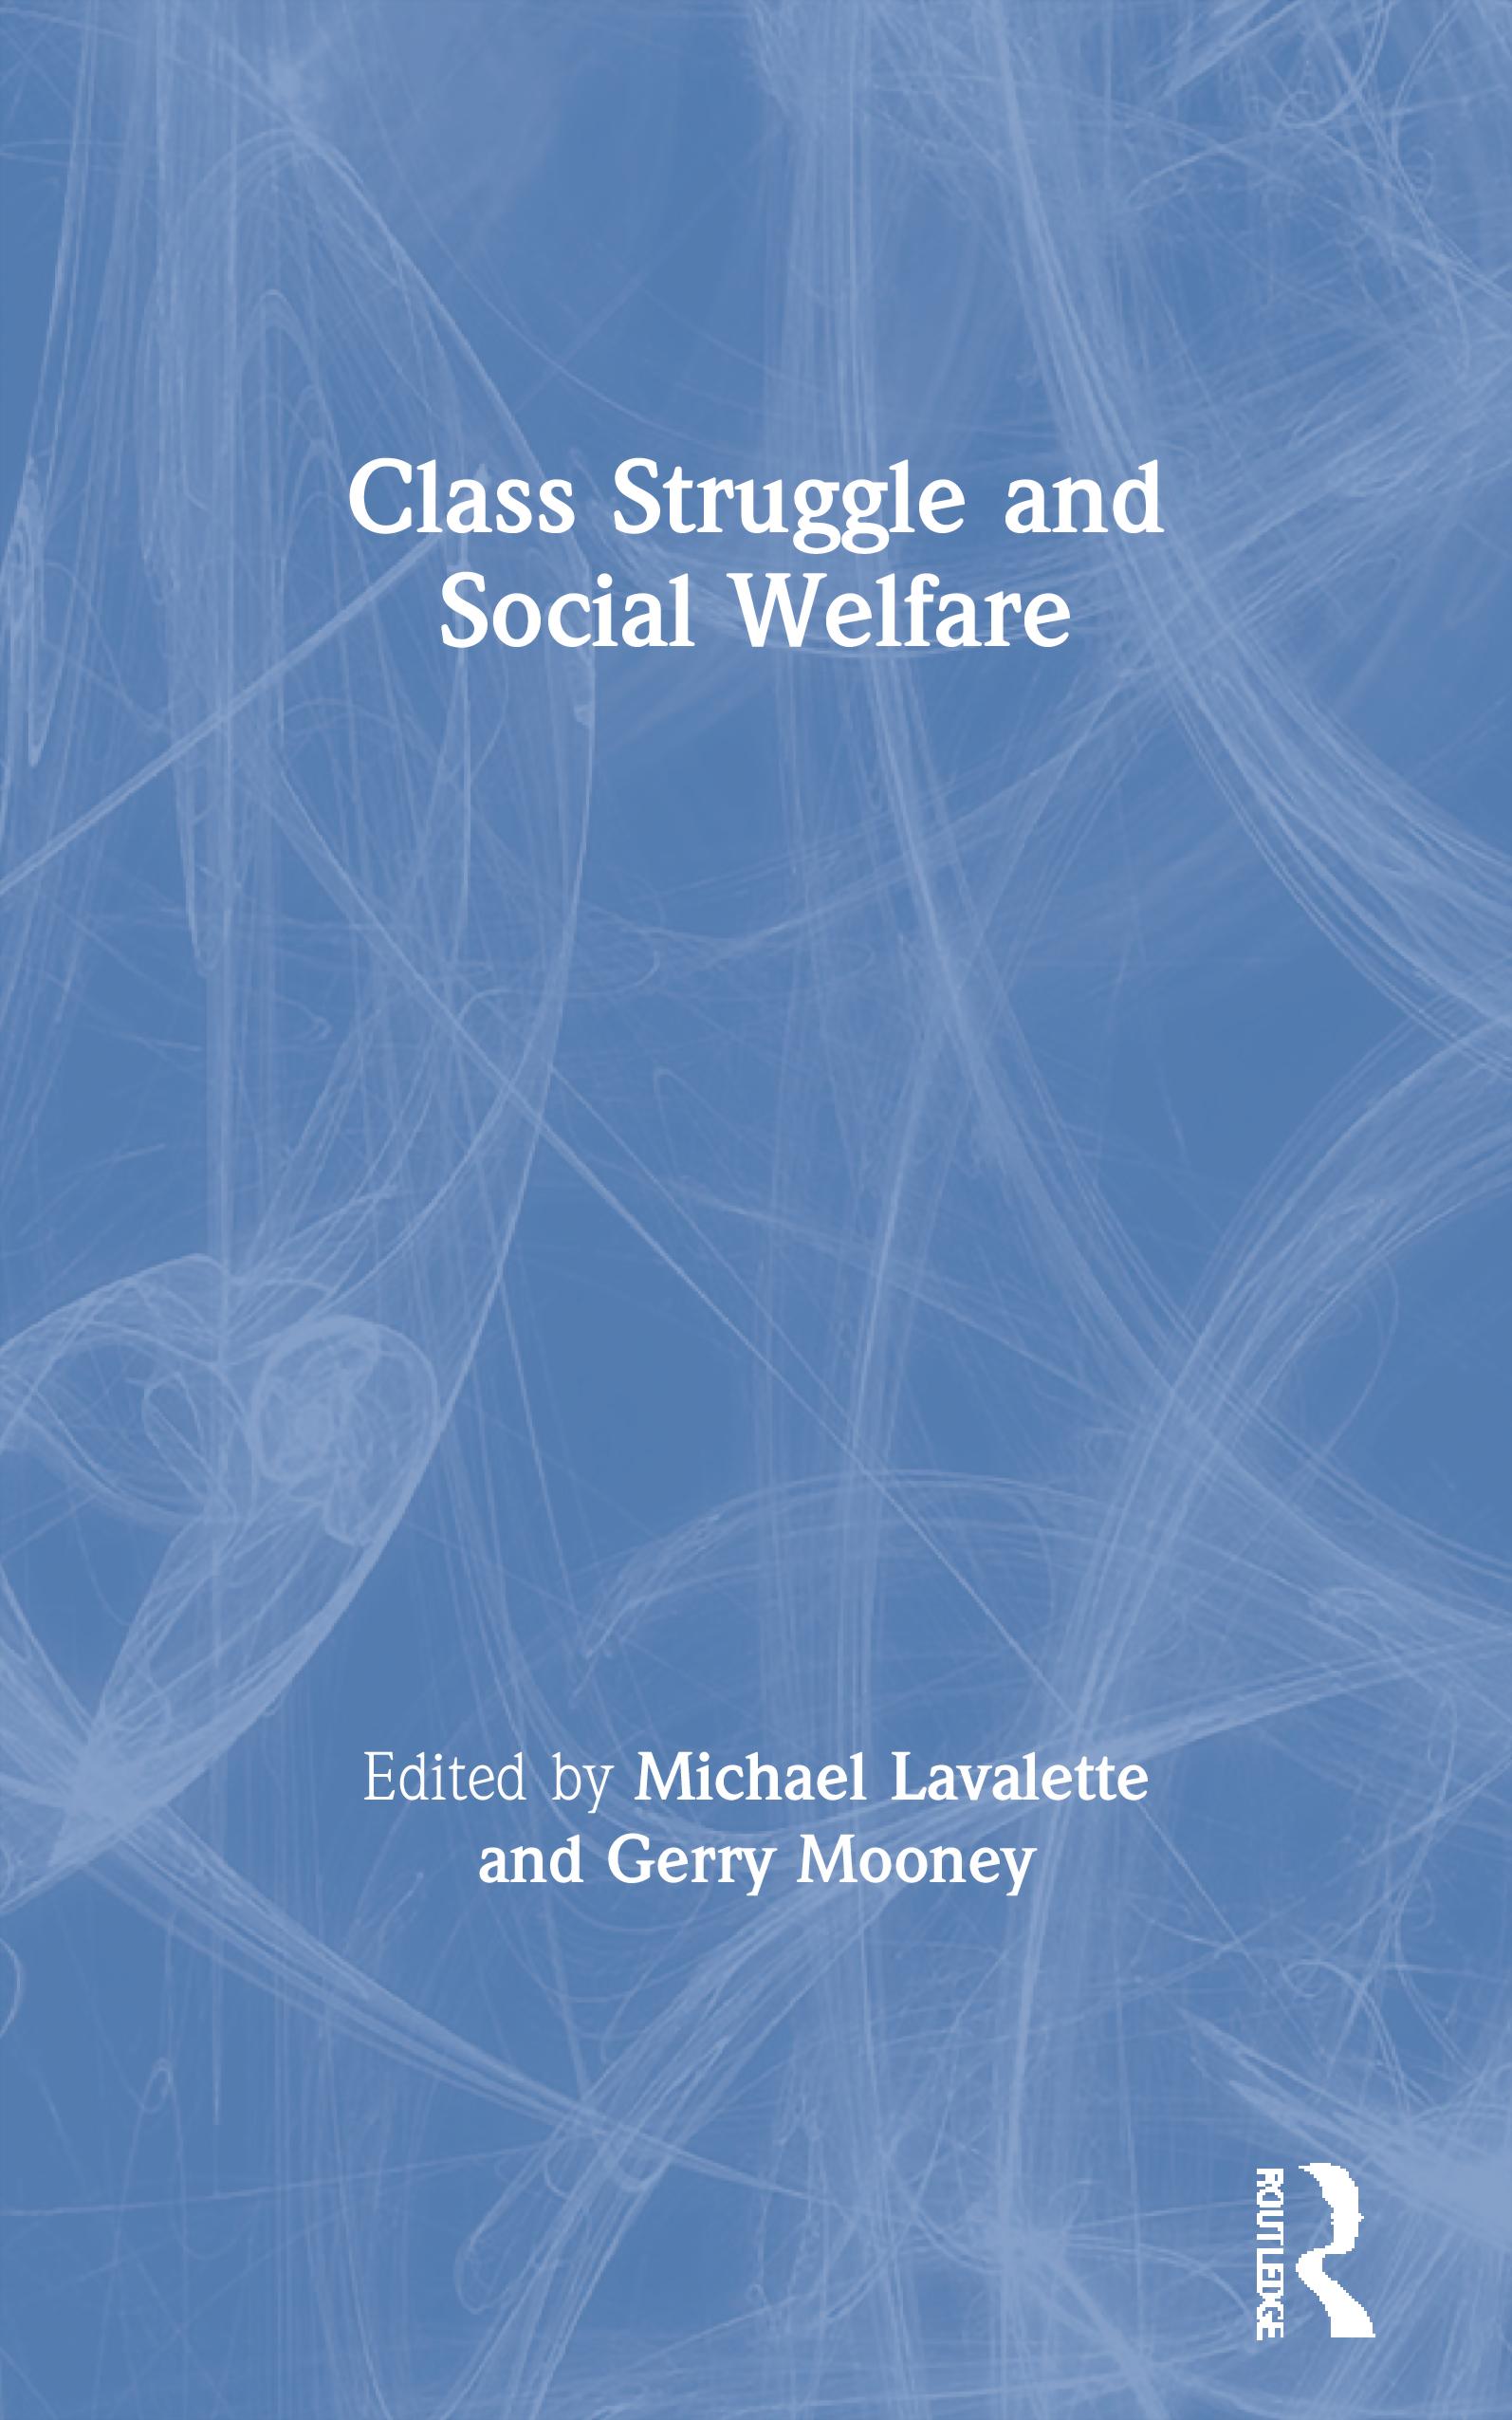 Class Struggle and Social Welfare